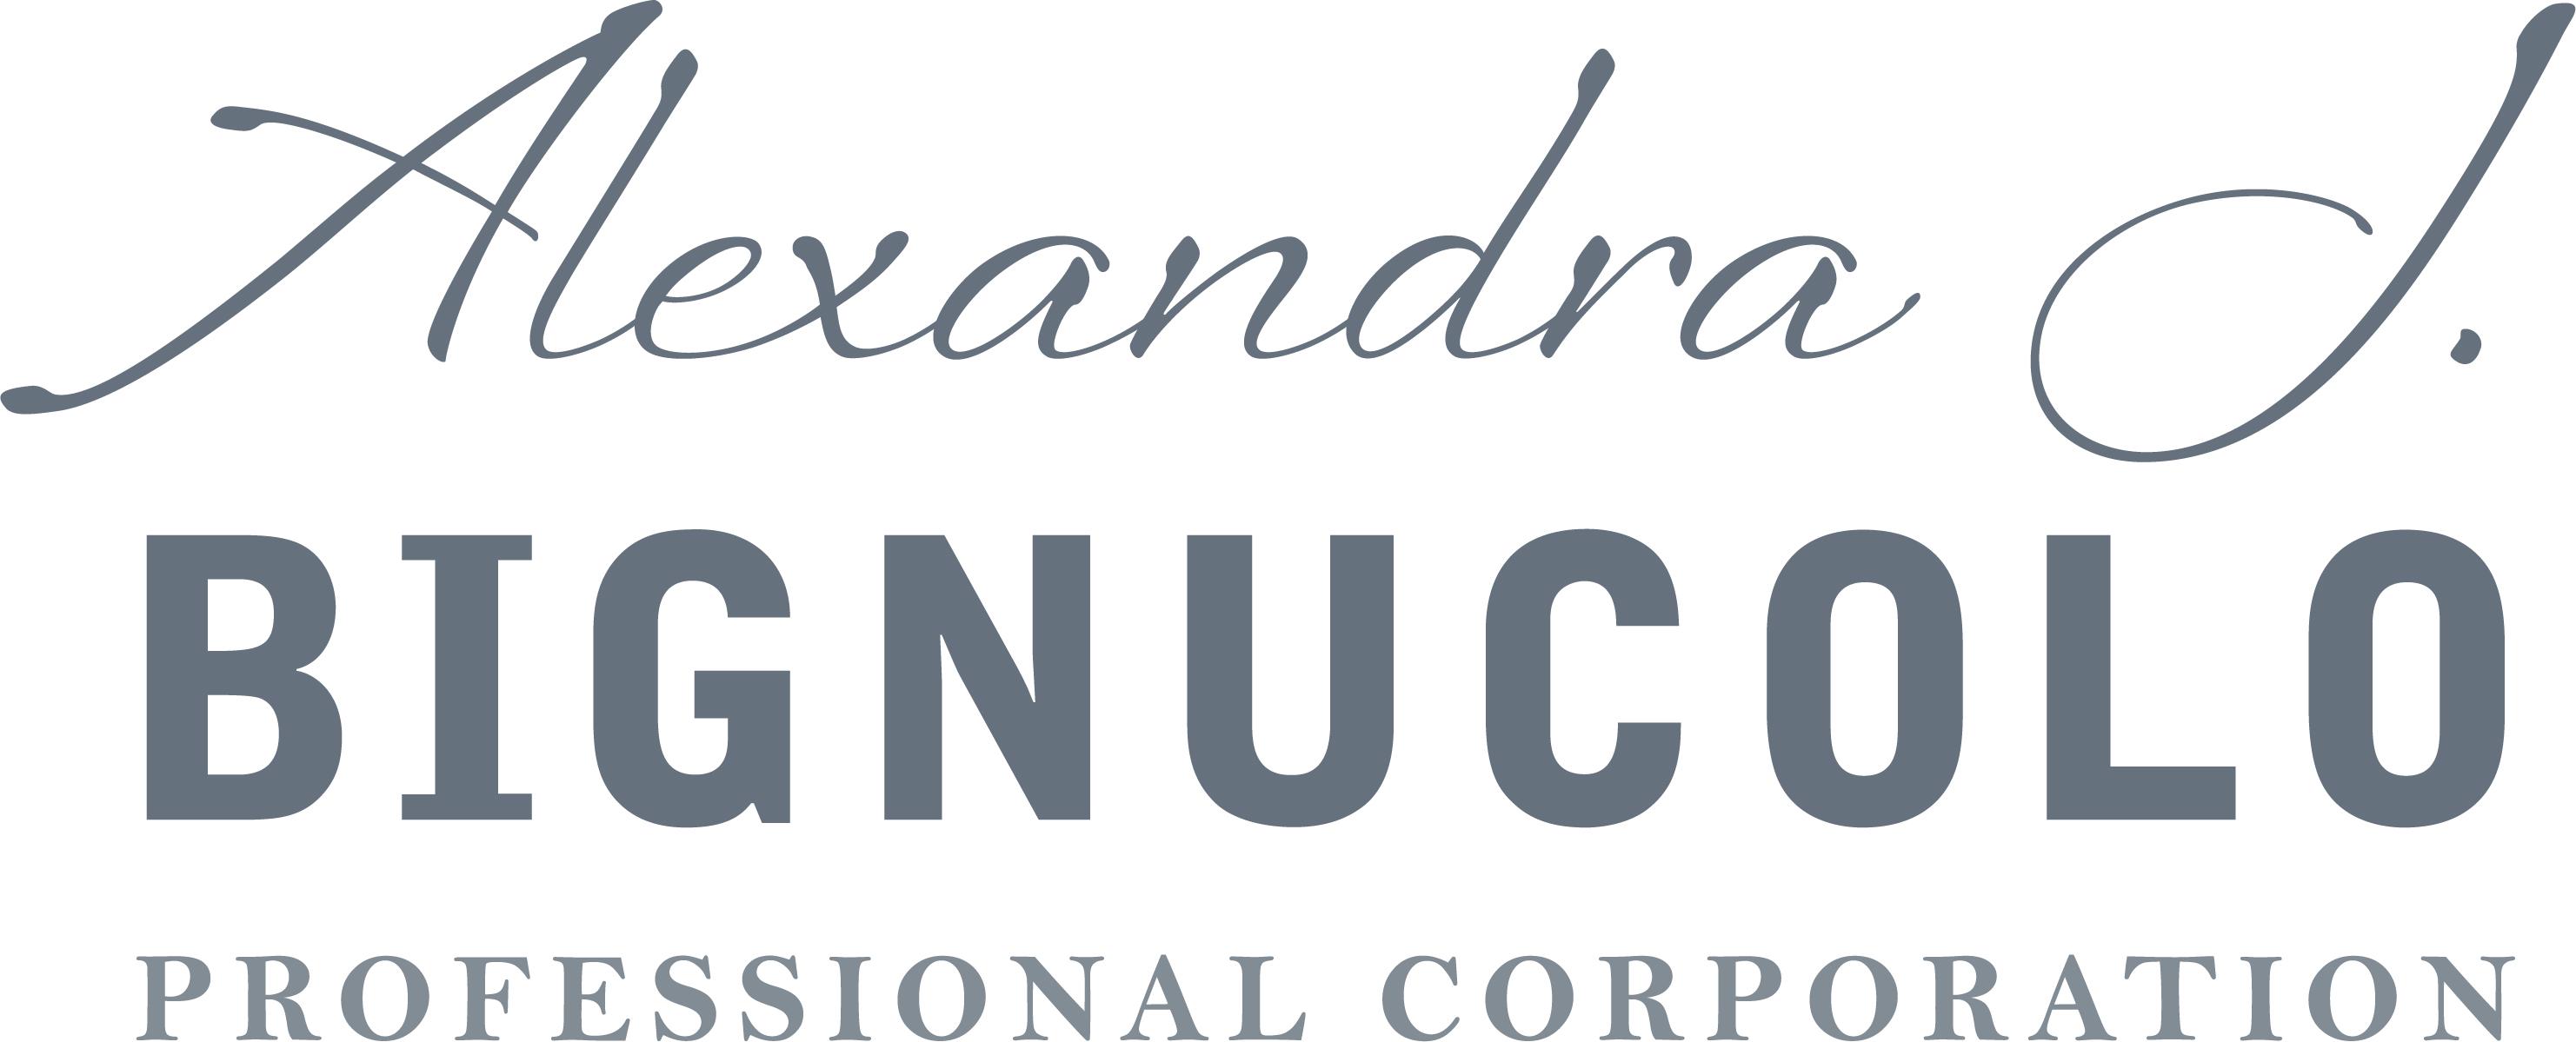 Alexandra J. Bignucolo Professional Corporation